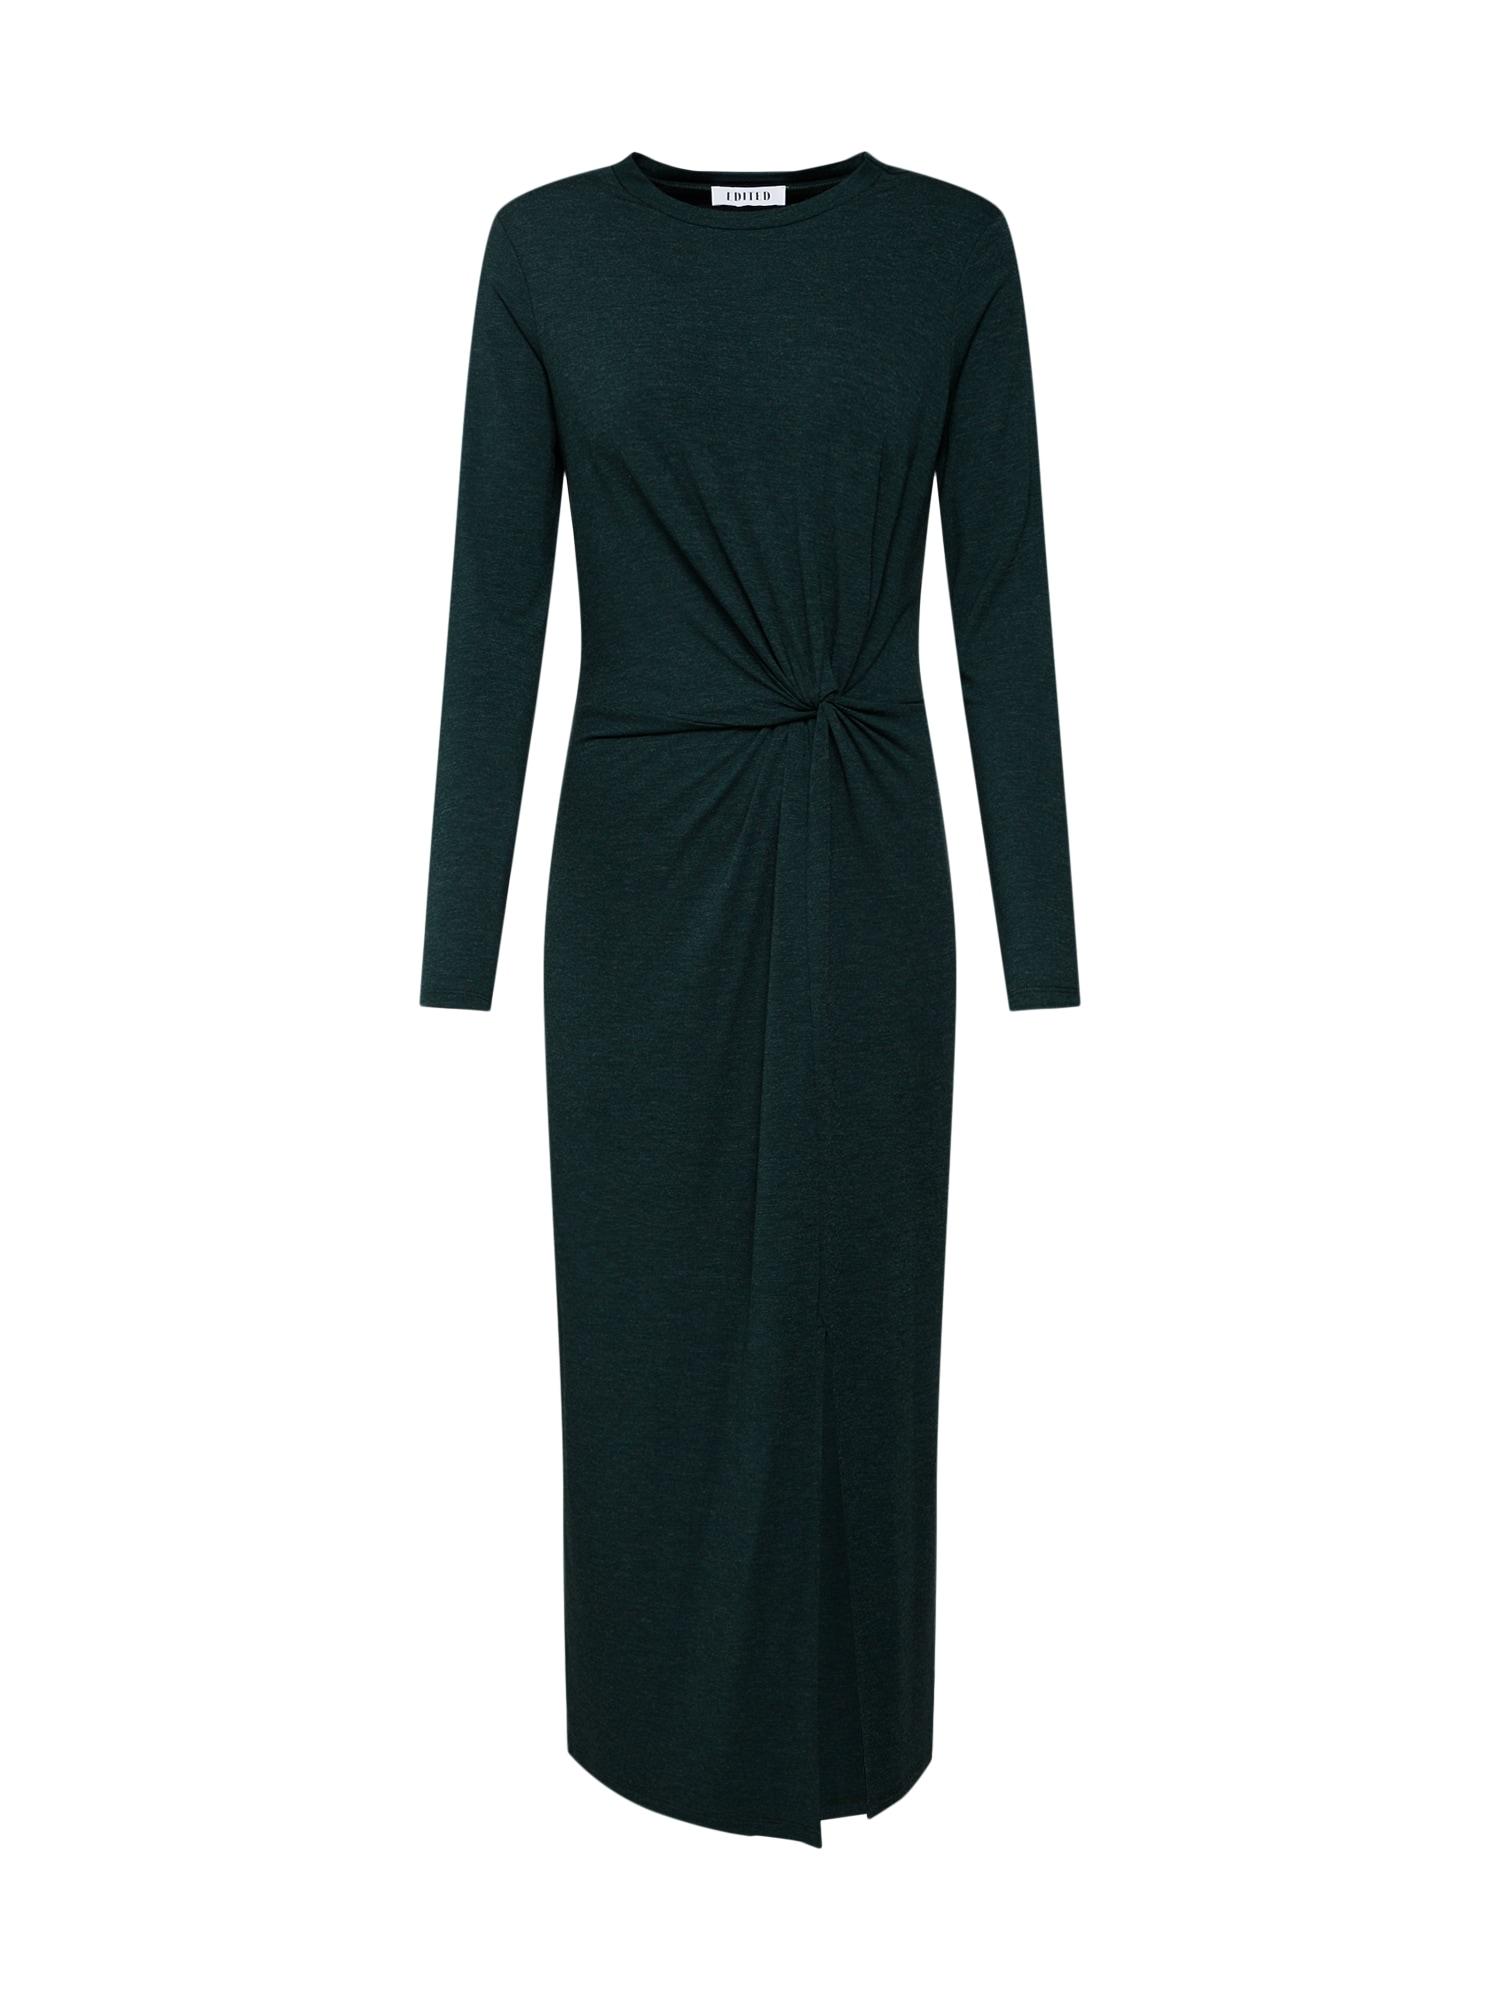 Šaty Meryl tmavě zelená EDITED